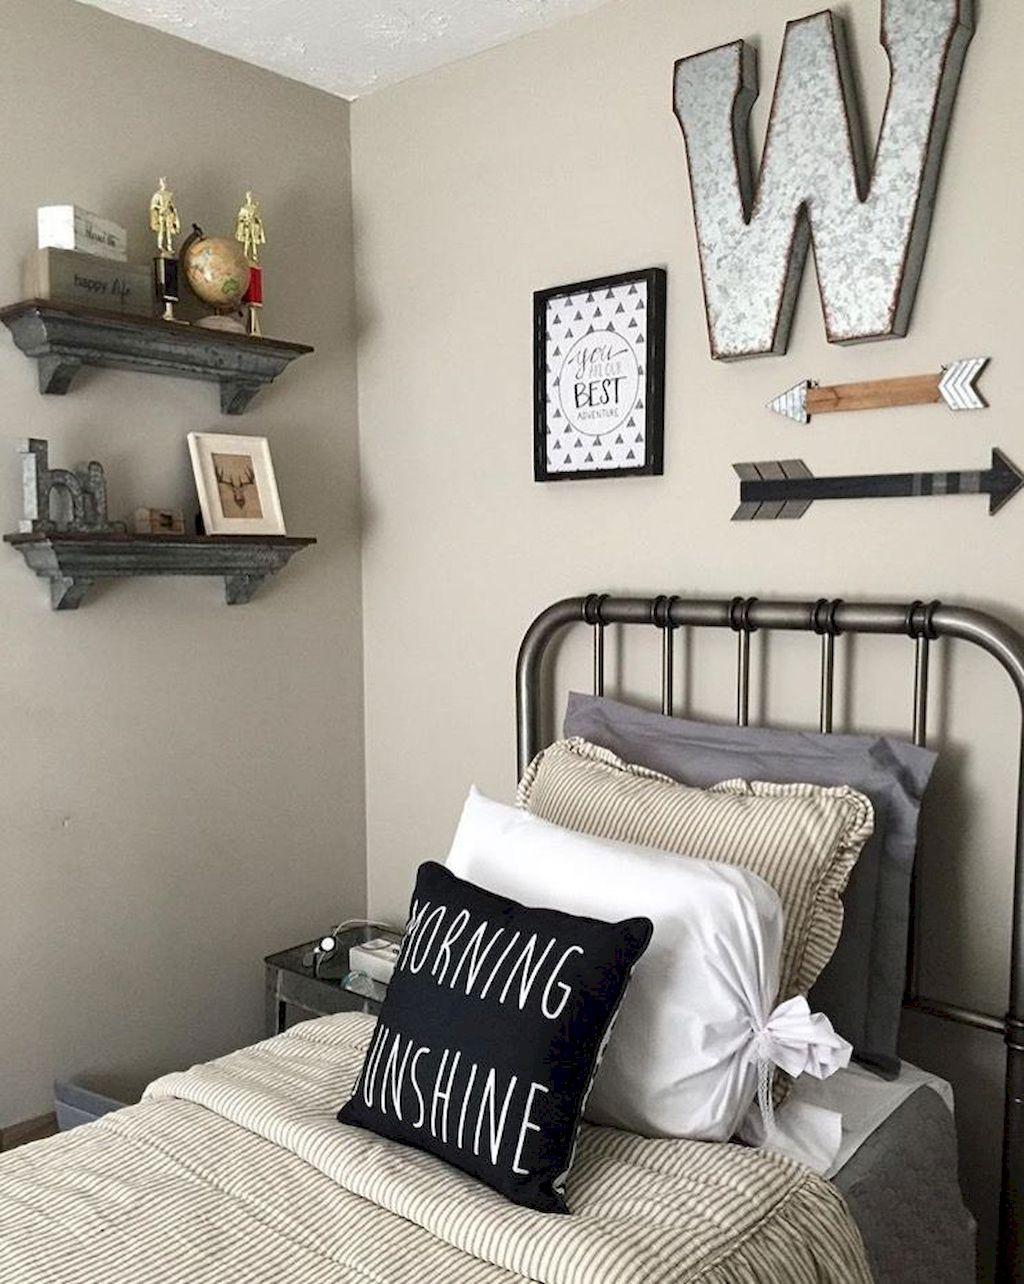 55 Best Farmhouse Style Bedroom Design Ideas  Farmhouse Style Custom Farmhouse Style Bedroom Inspiration Design